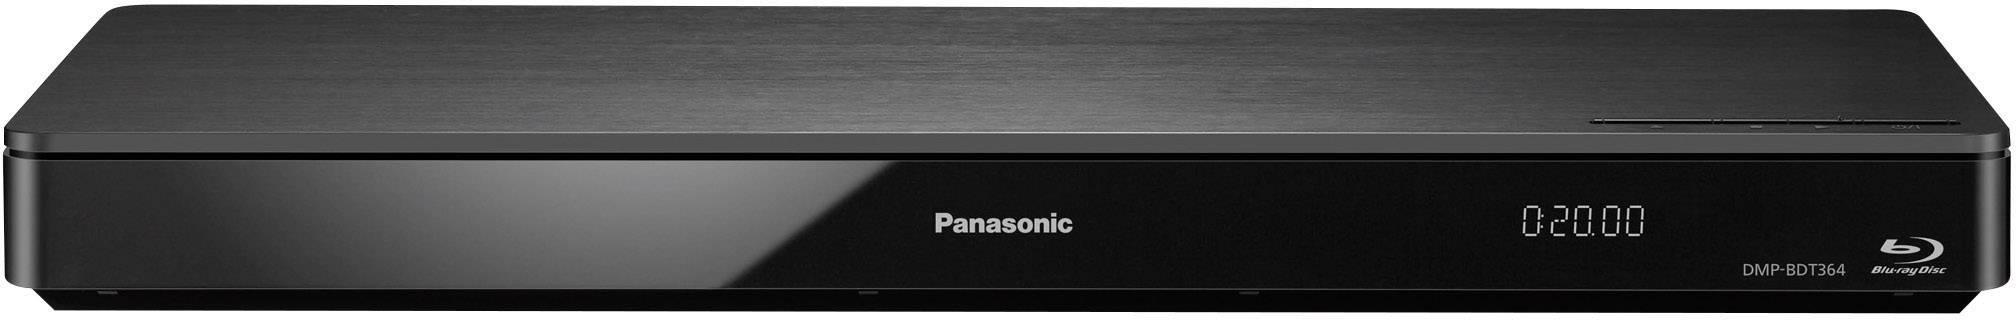 New Driver: Panasonic DMP-BDT364EG Blu-ray Player